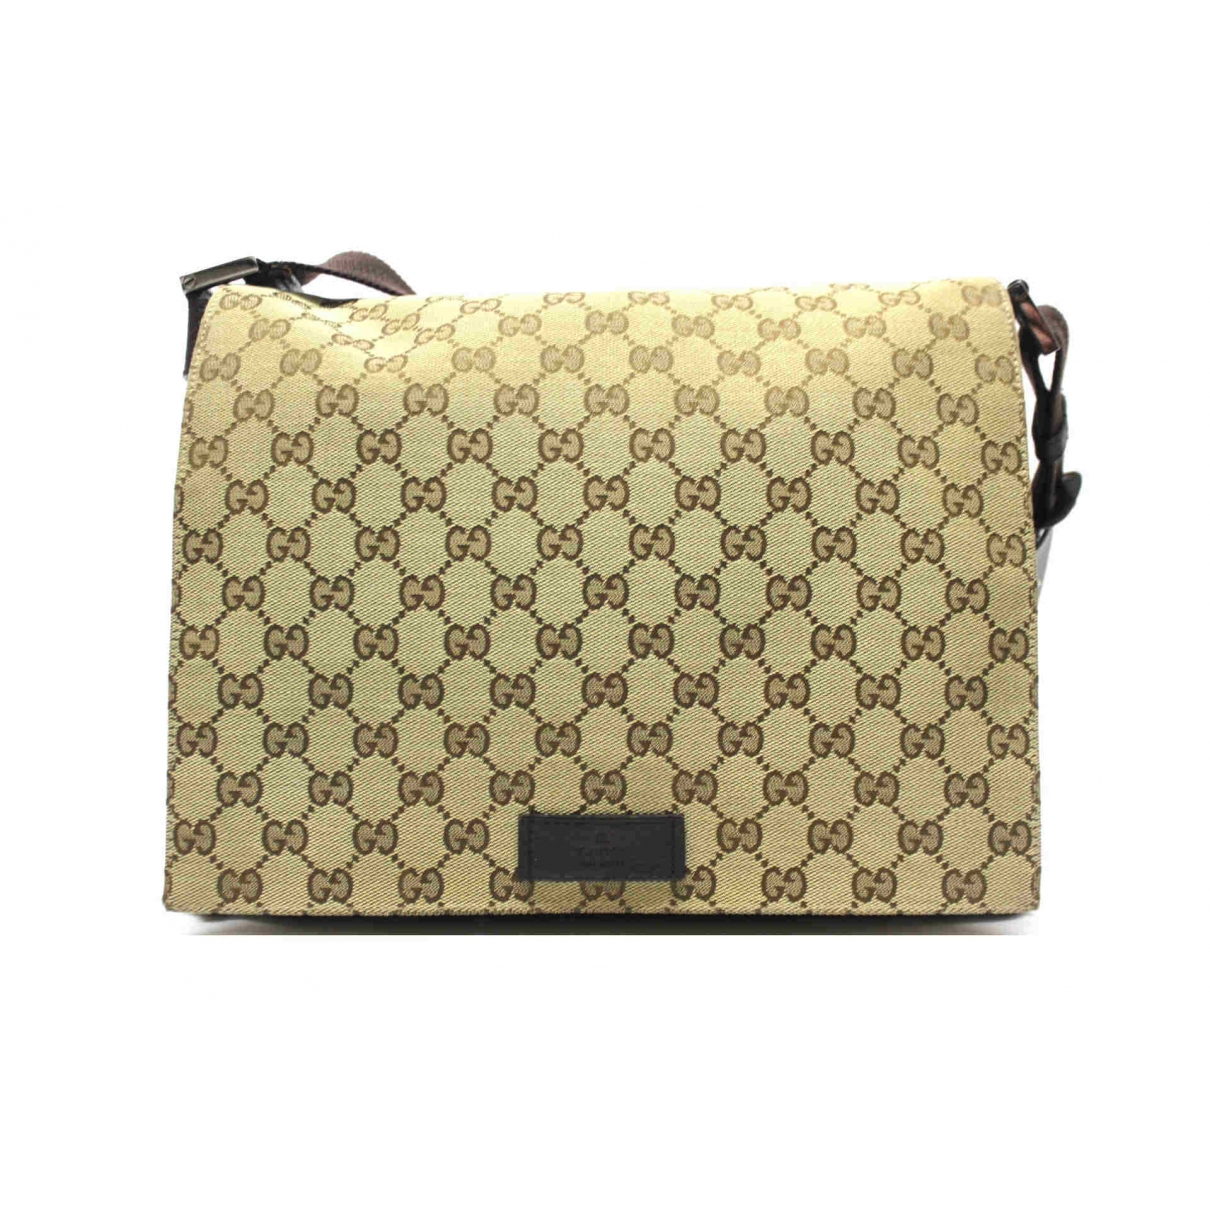 Gucci \N Beige Cloth bag for Men \N